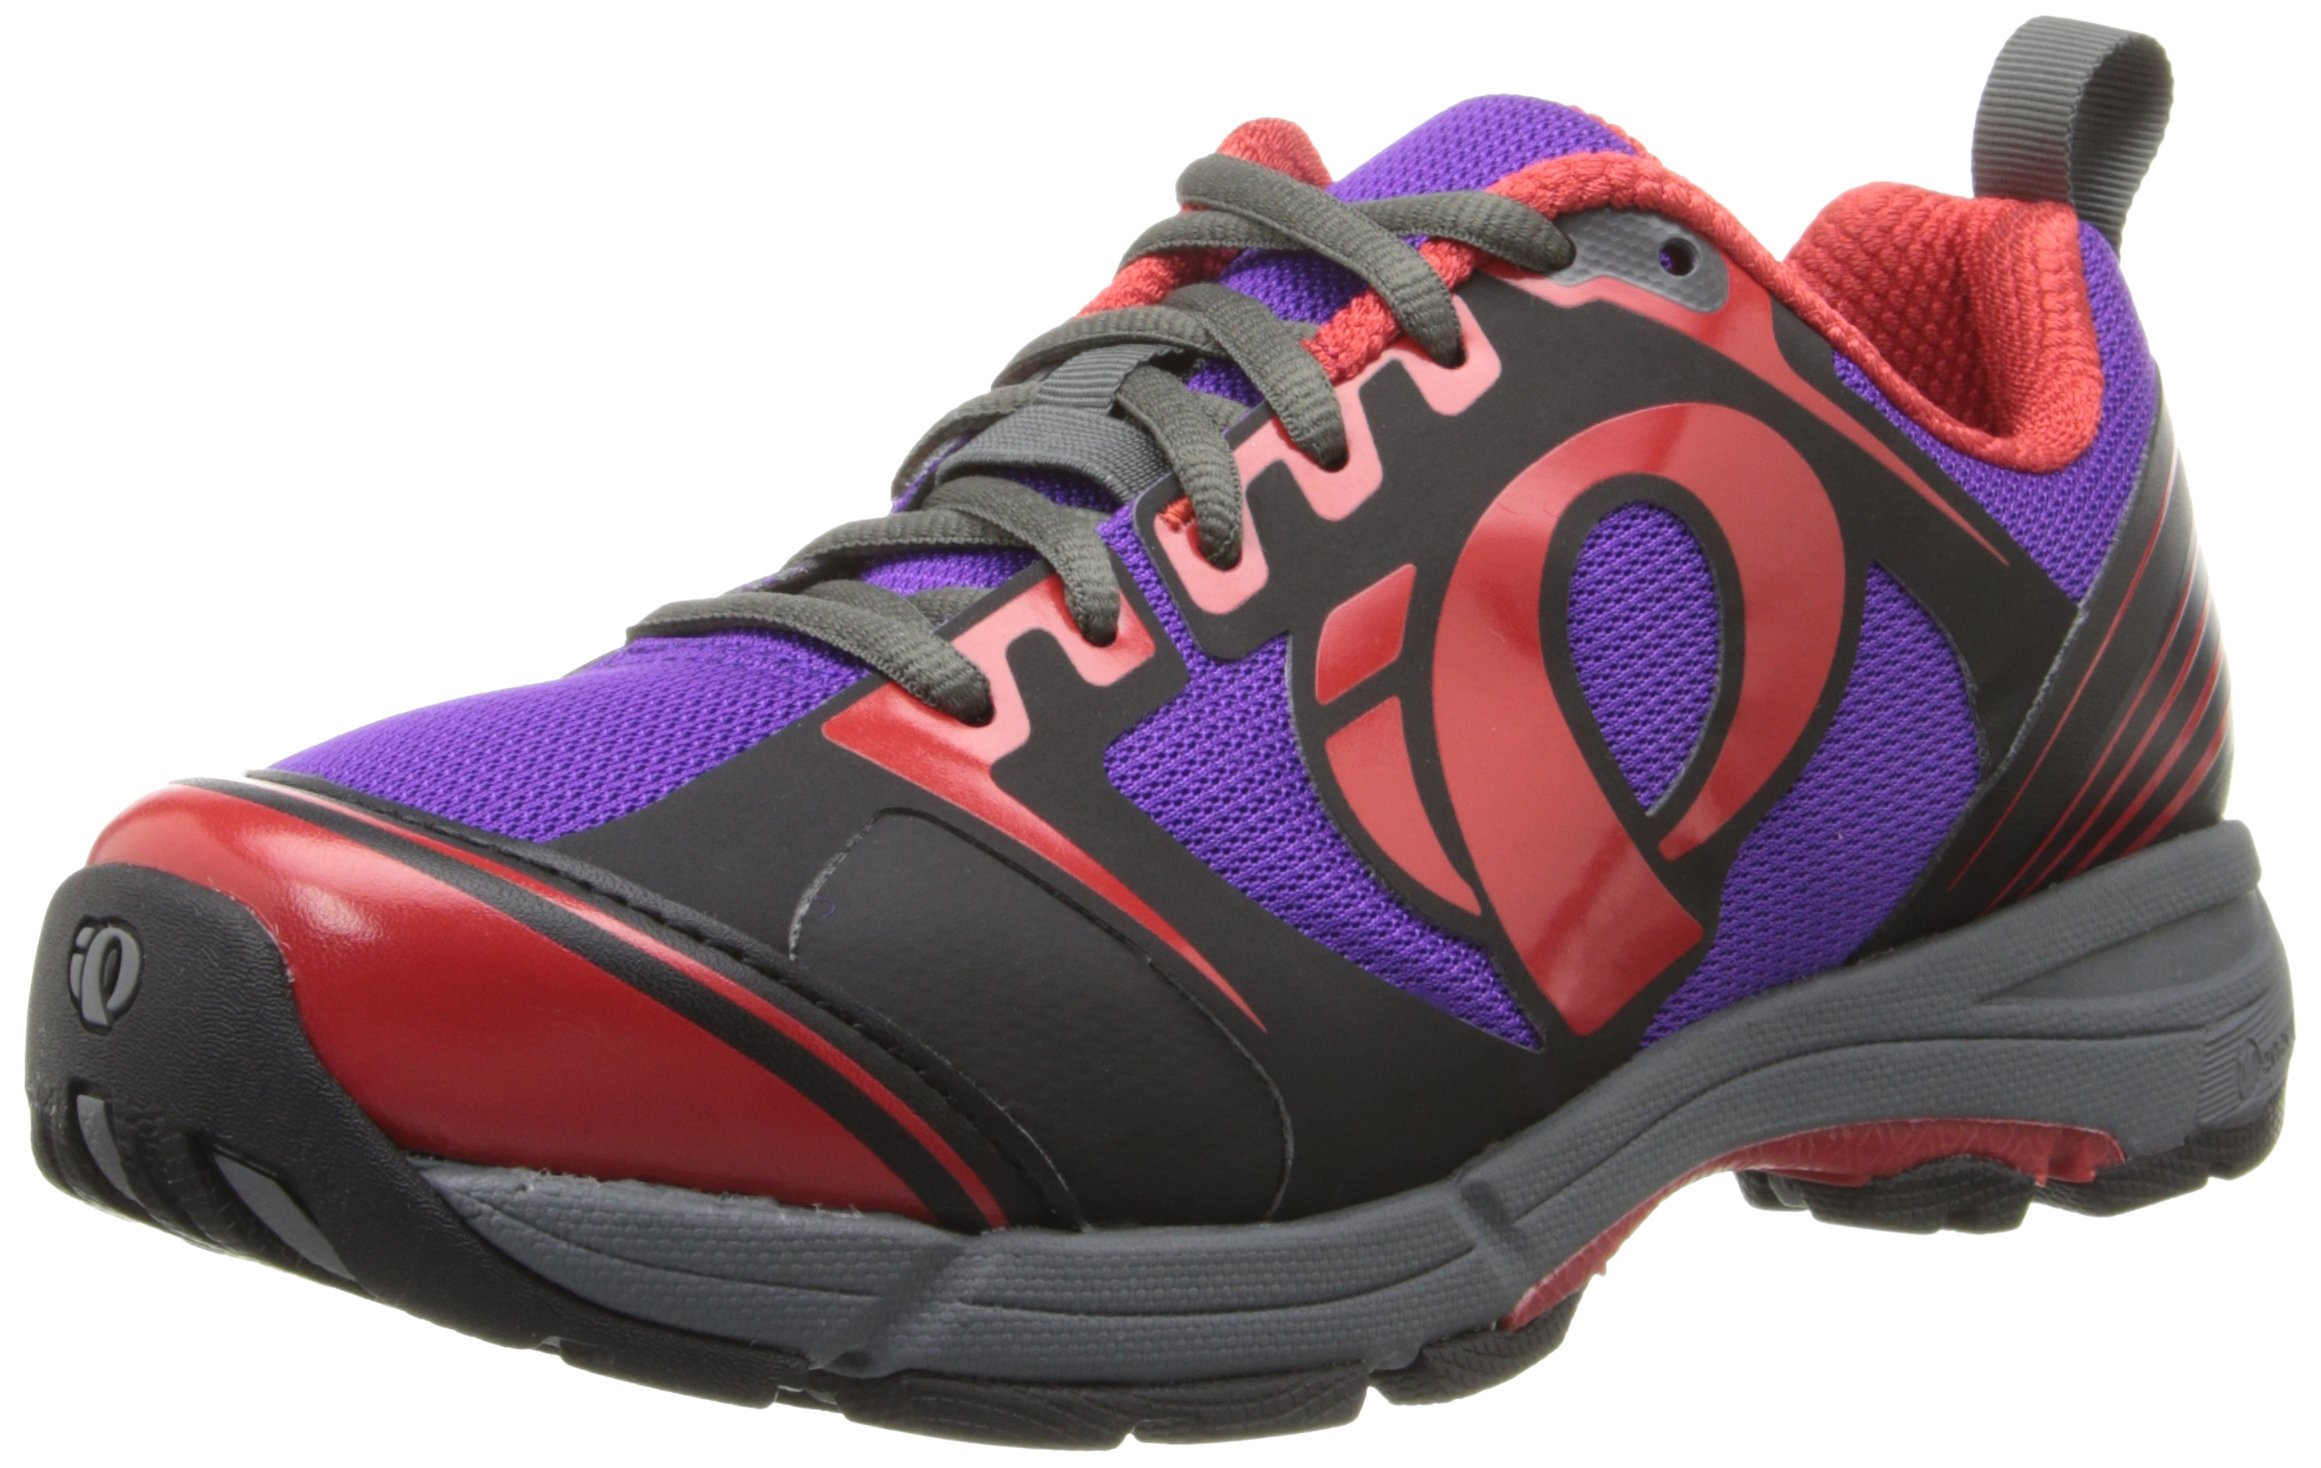 Pearl Izumi Women's W X-road Fuel Iii B/p Cycling Shoe, Black/Purple, 38 EU/6.8 B US